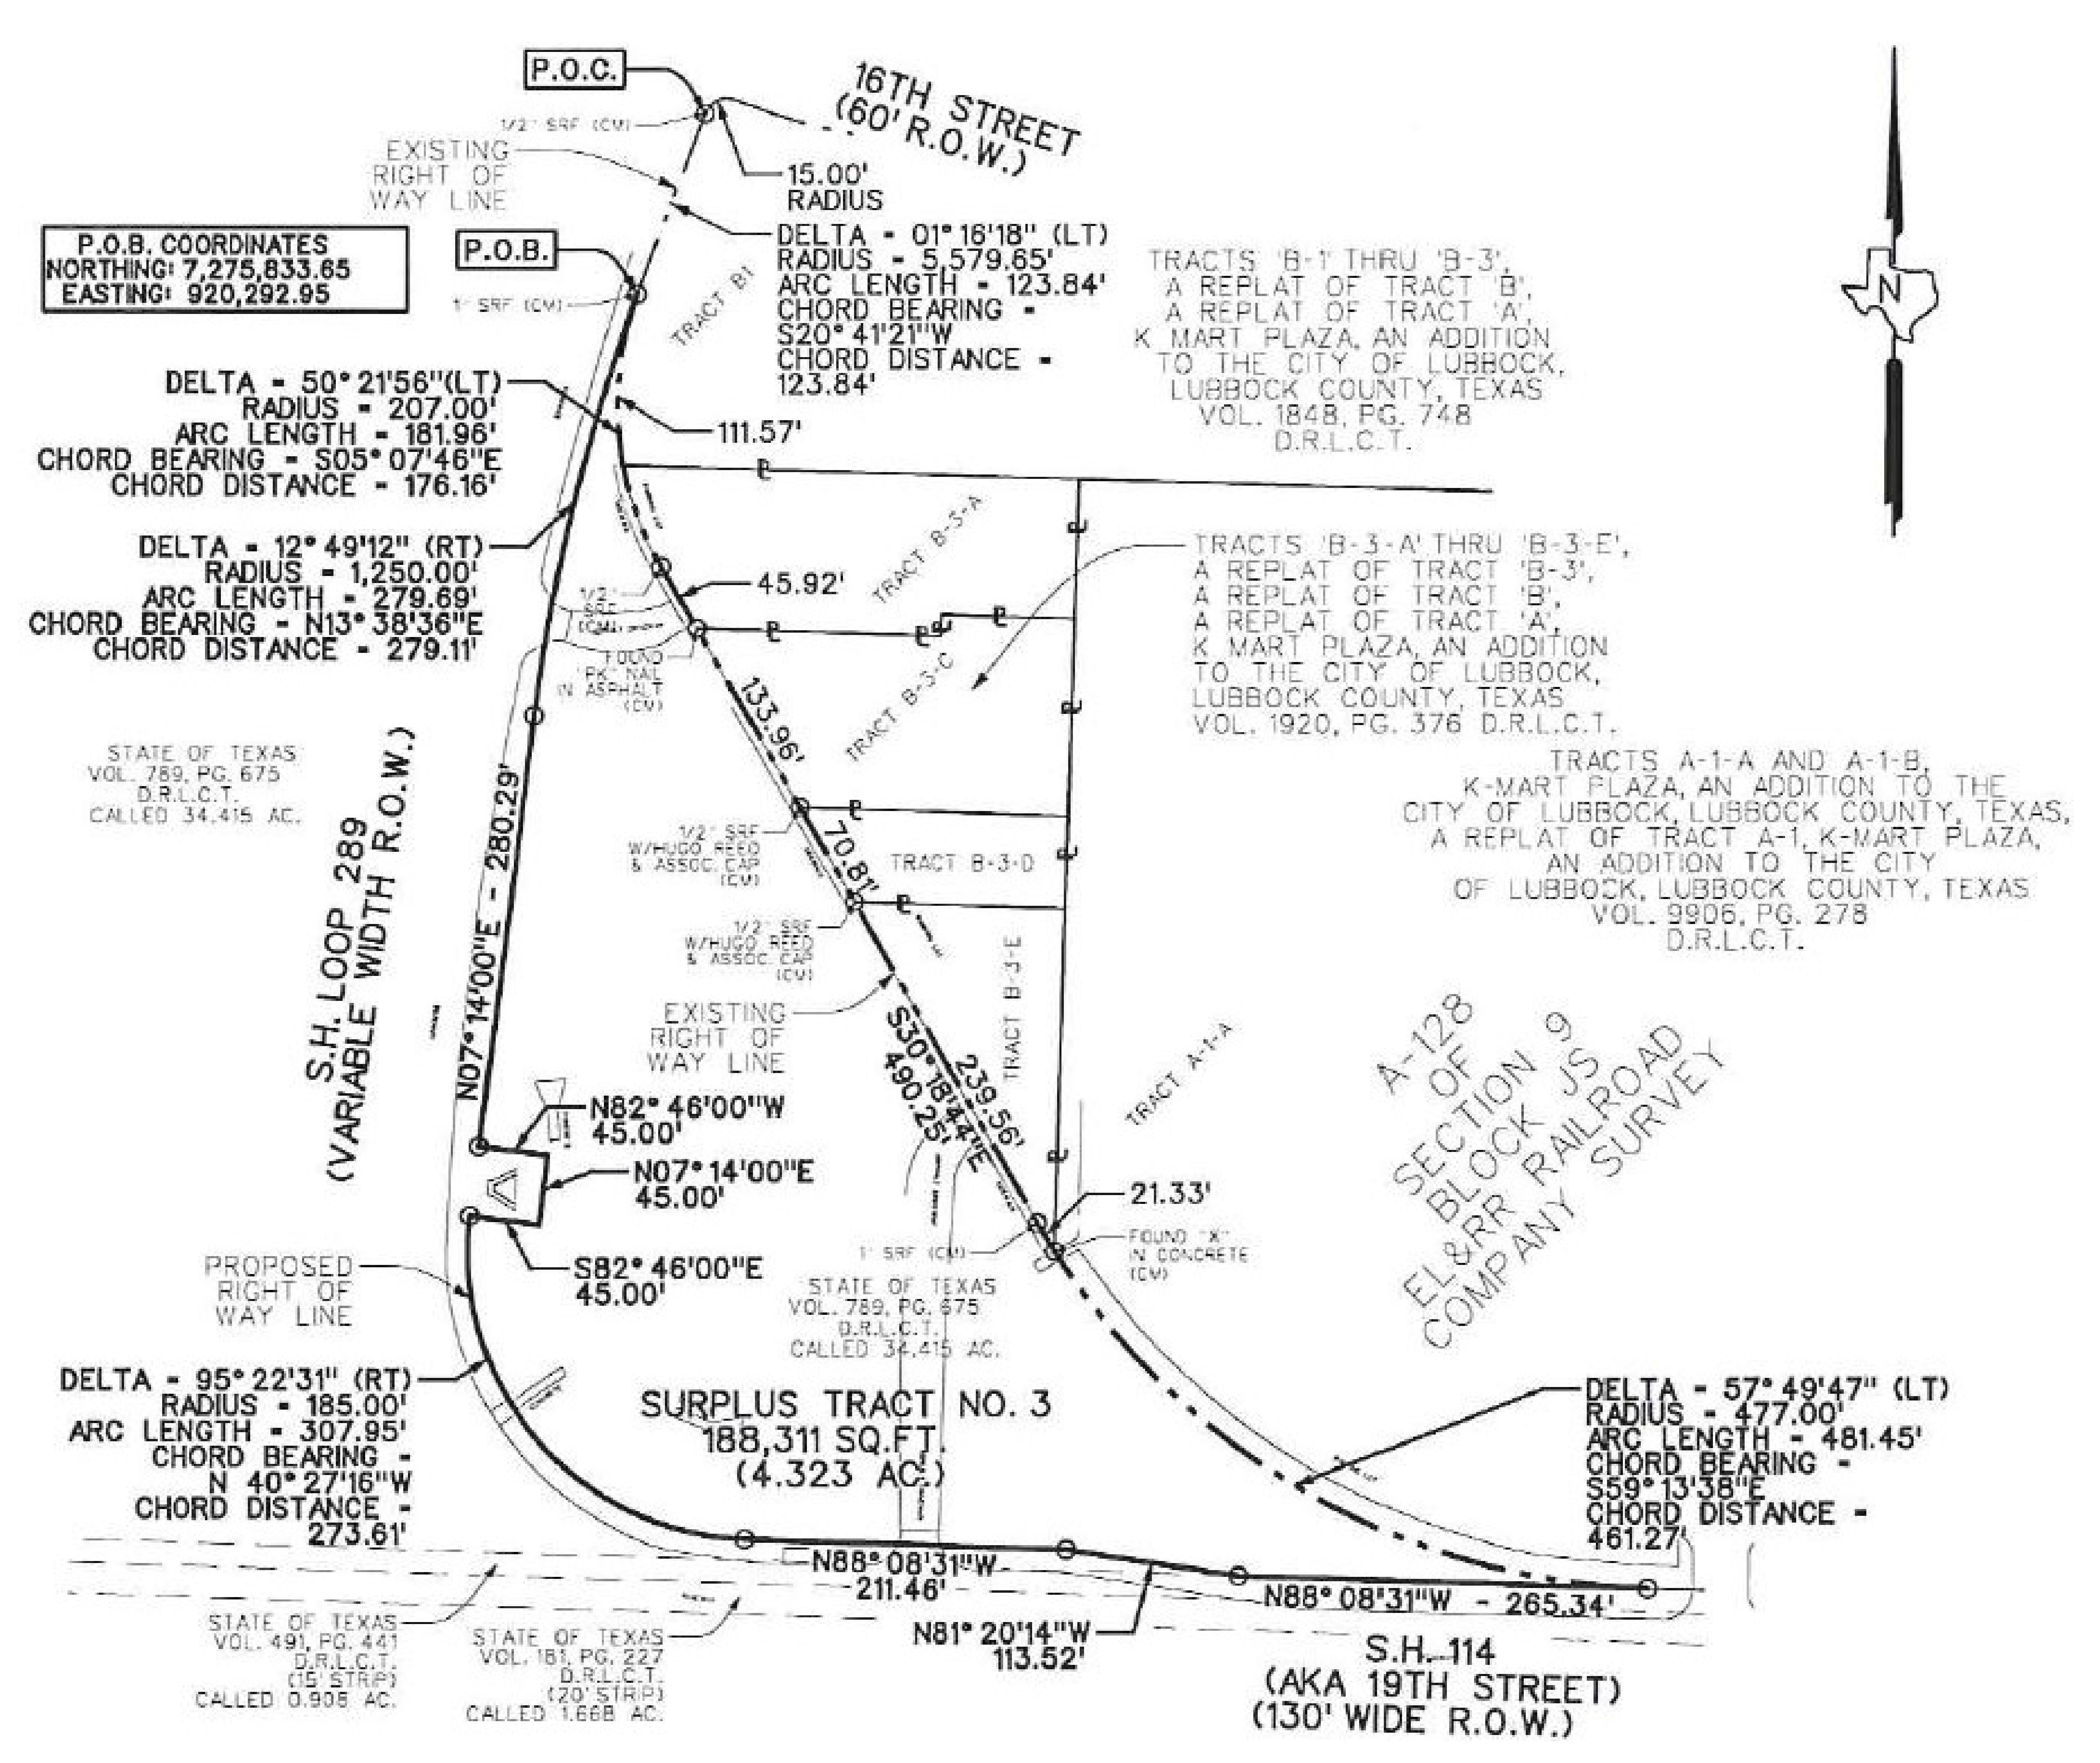 NEC Loop 289 & 19th St: site plan